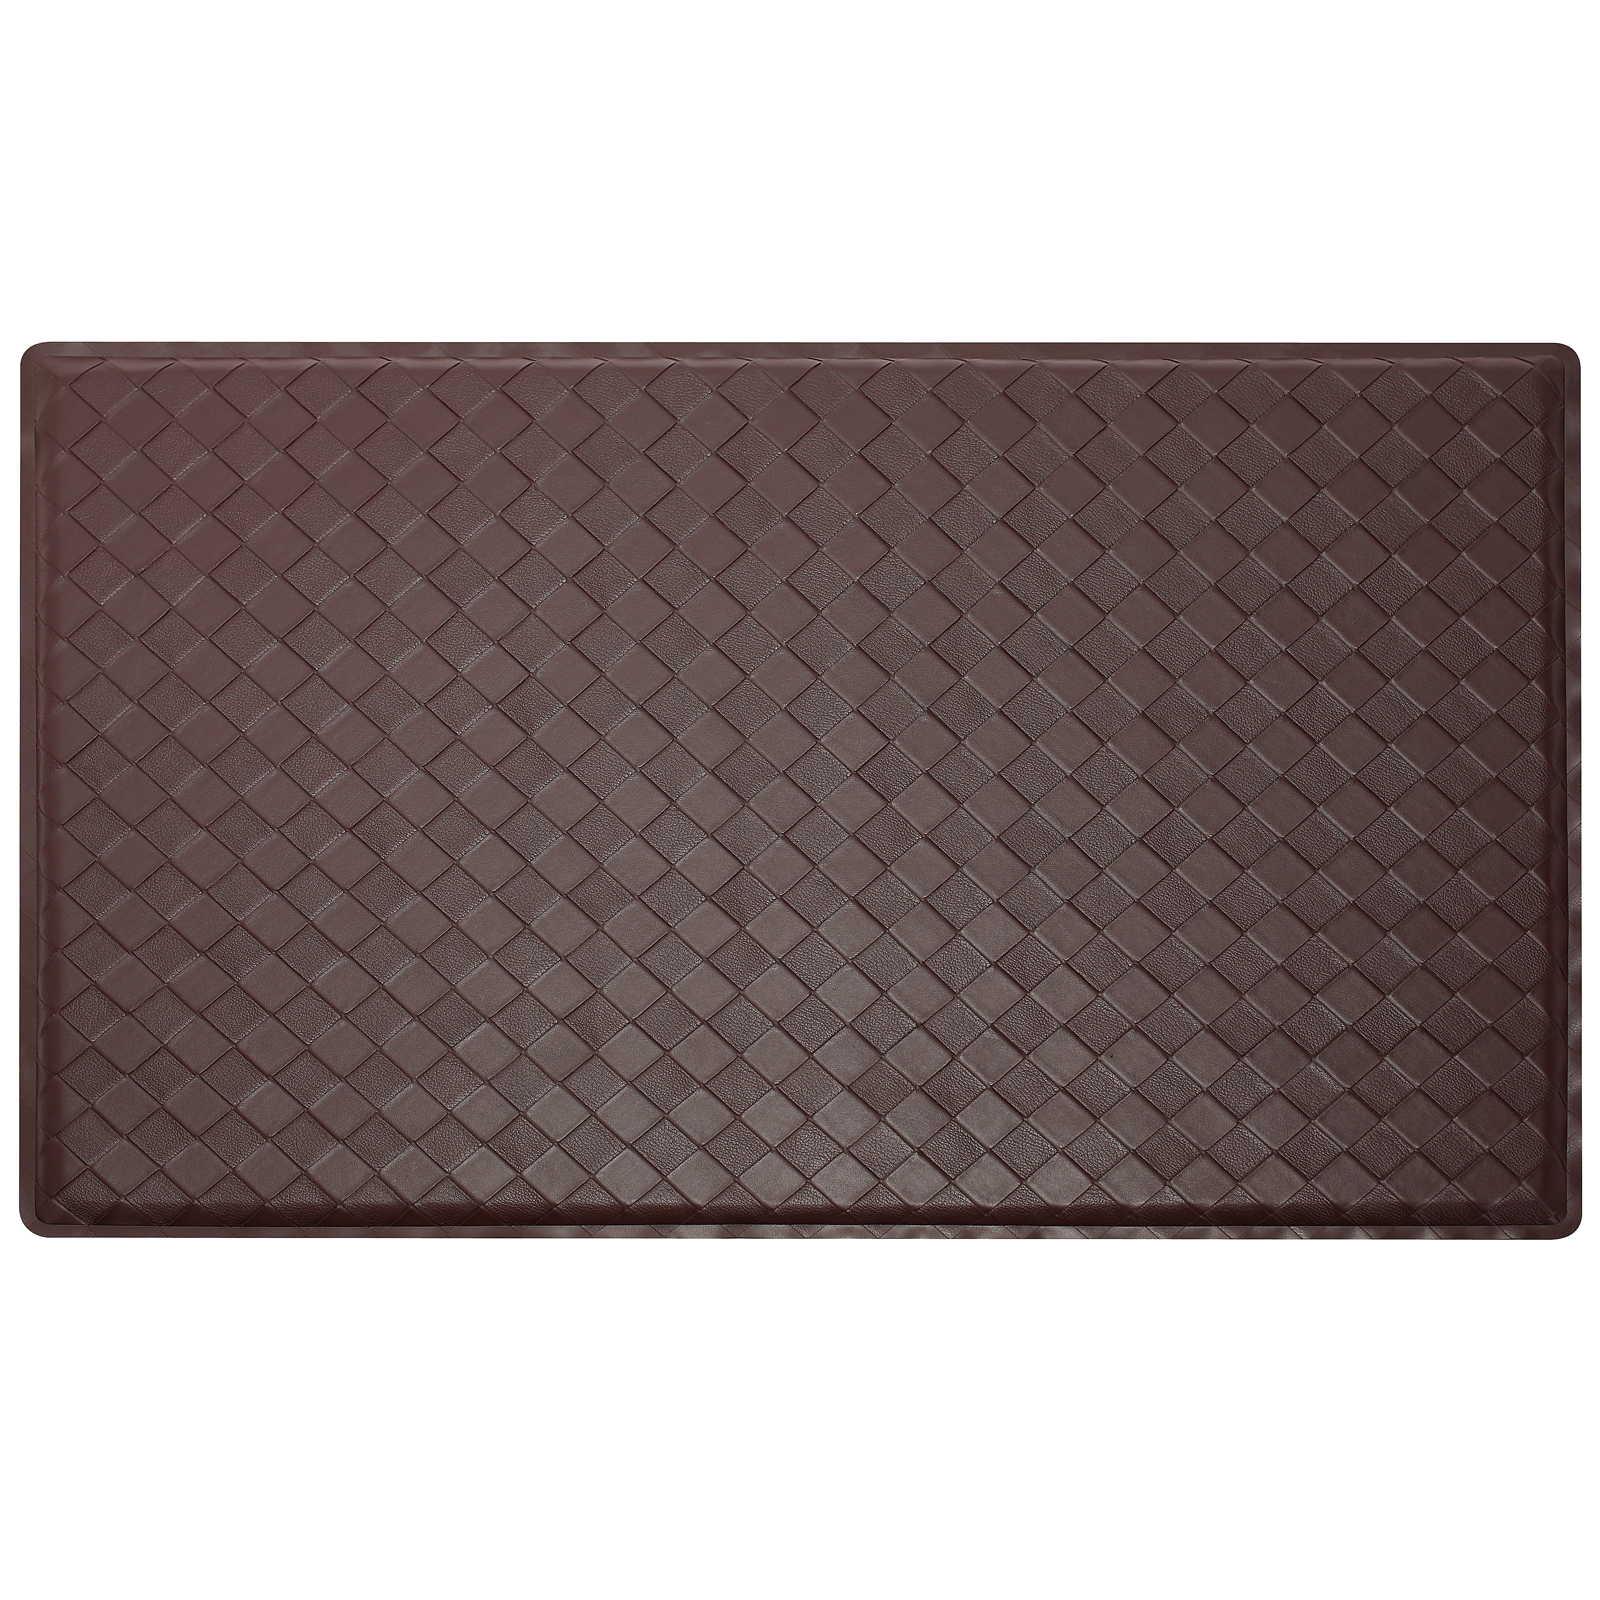 about 2 39 x 3 39 modern anti fatigue kitchen floor mat rug basket